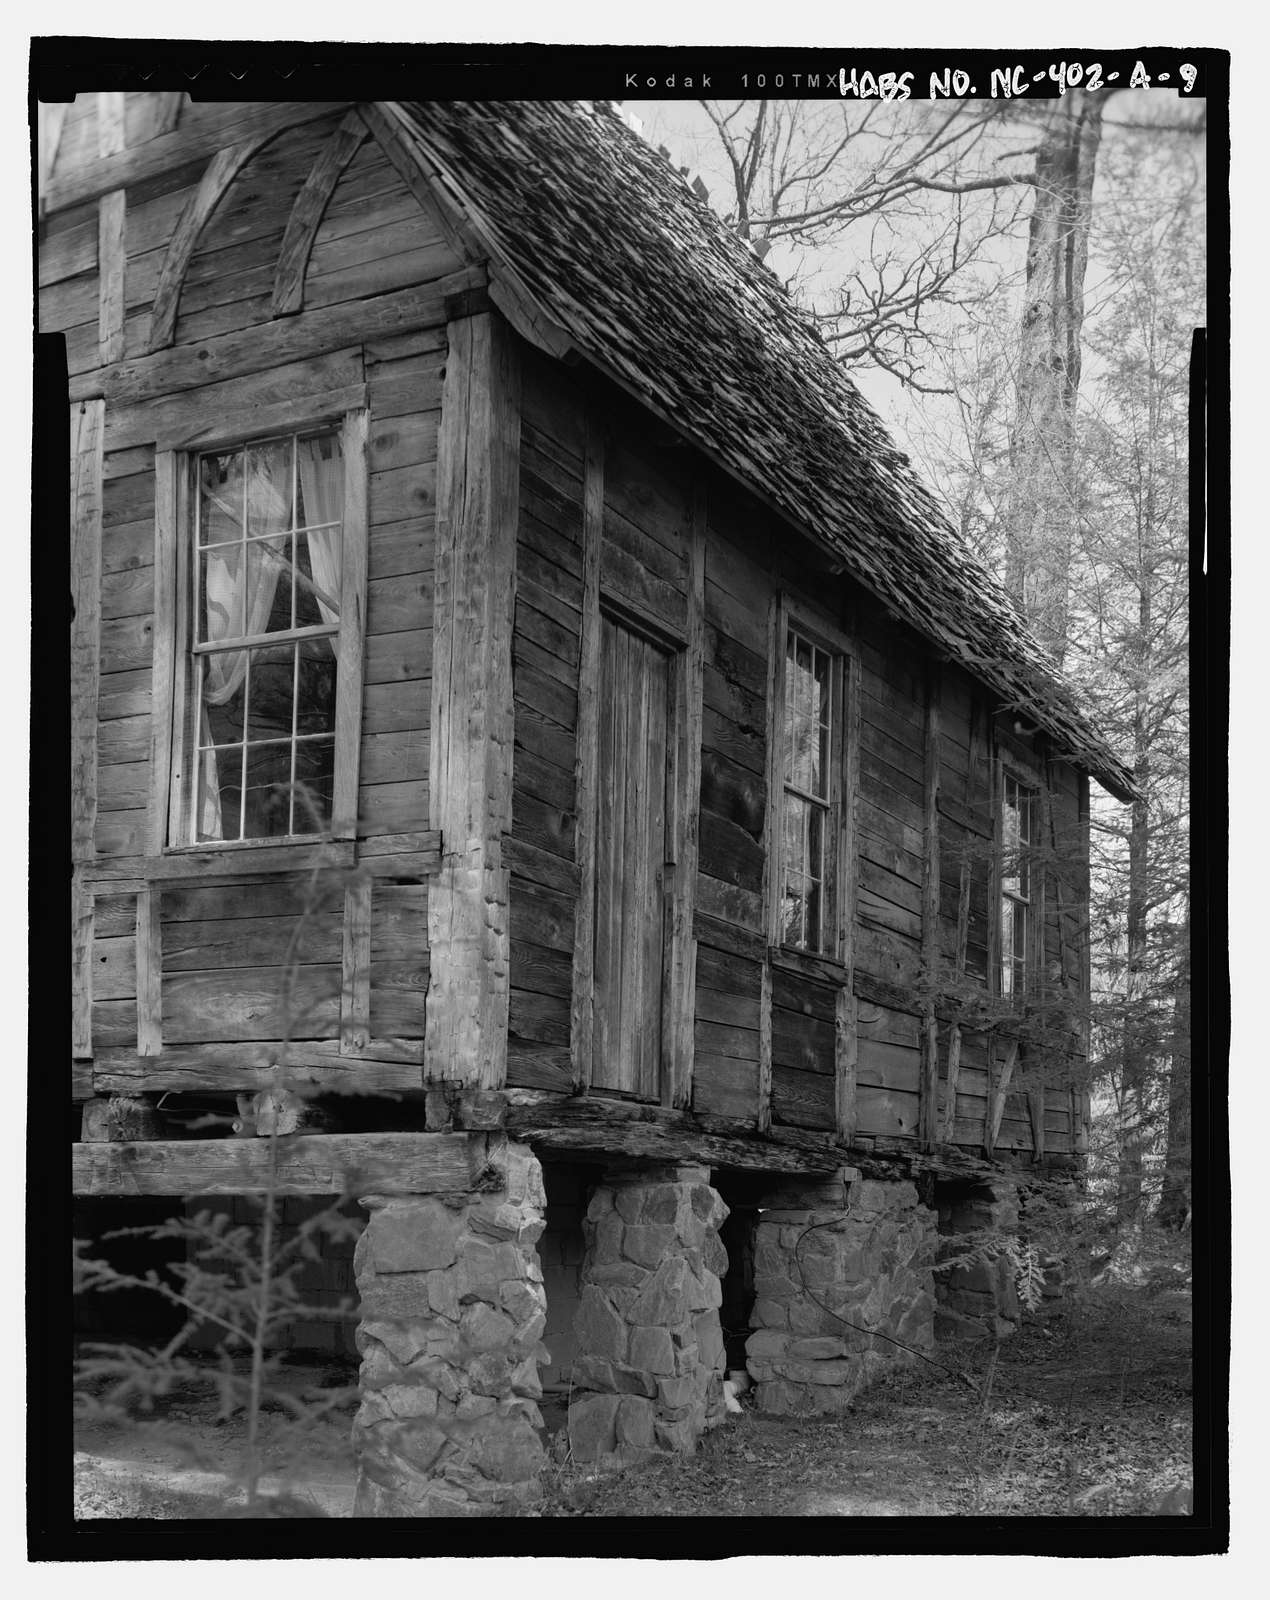 Biltmore Forestry School, Cantrell Creek Lodge, Brevard, Transylvania County, NC